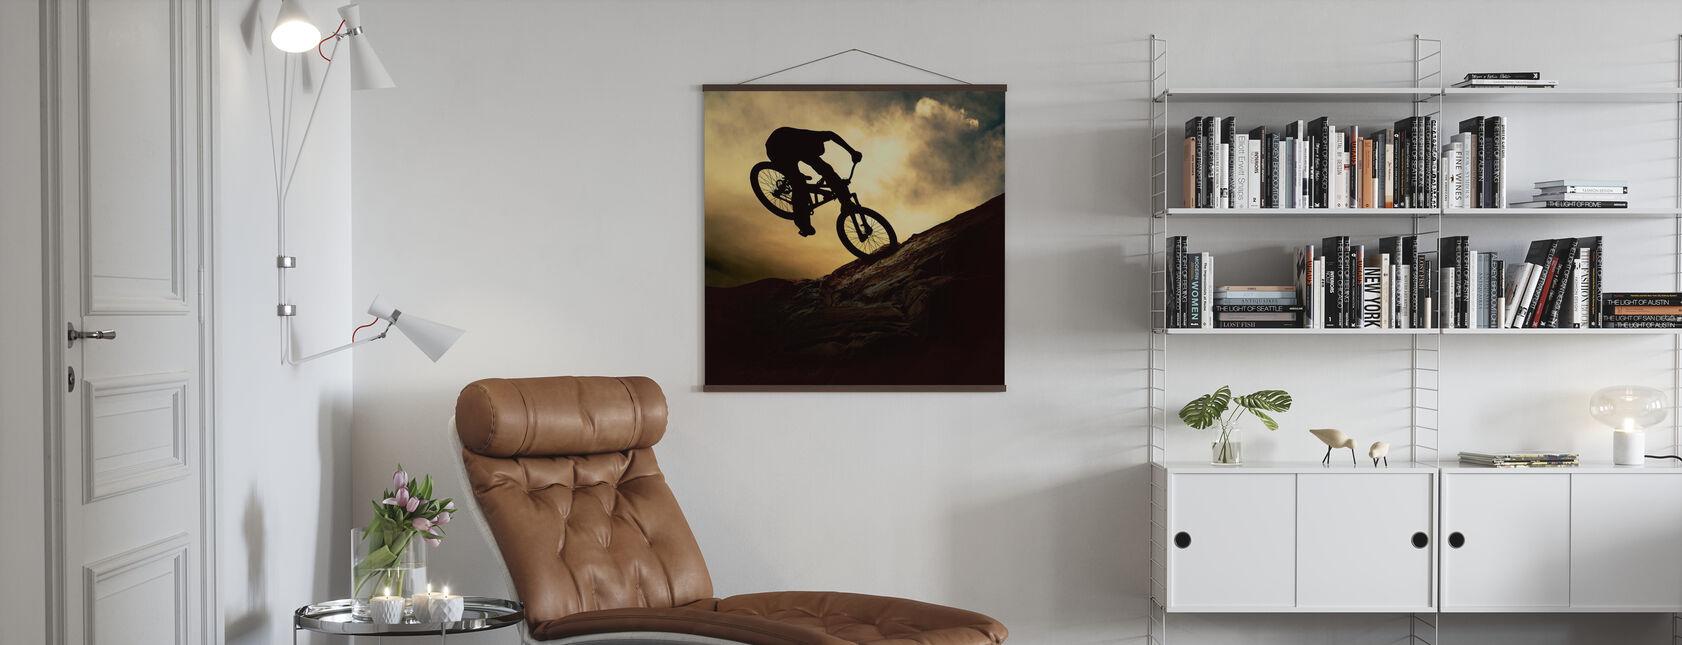 Mountain Bike Rider - Poster - Living Room